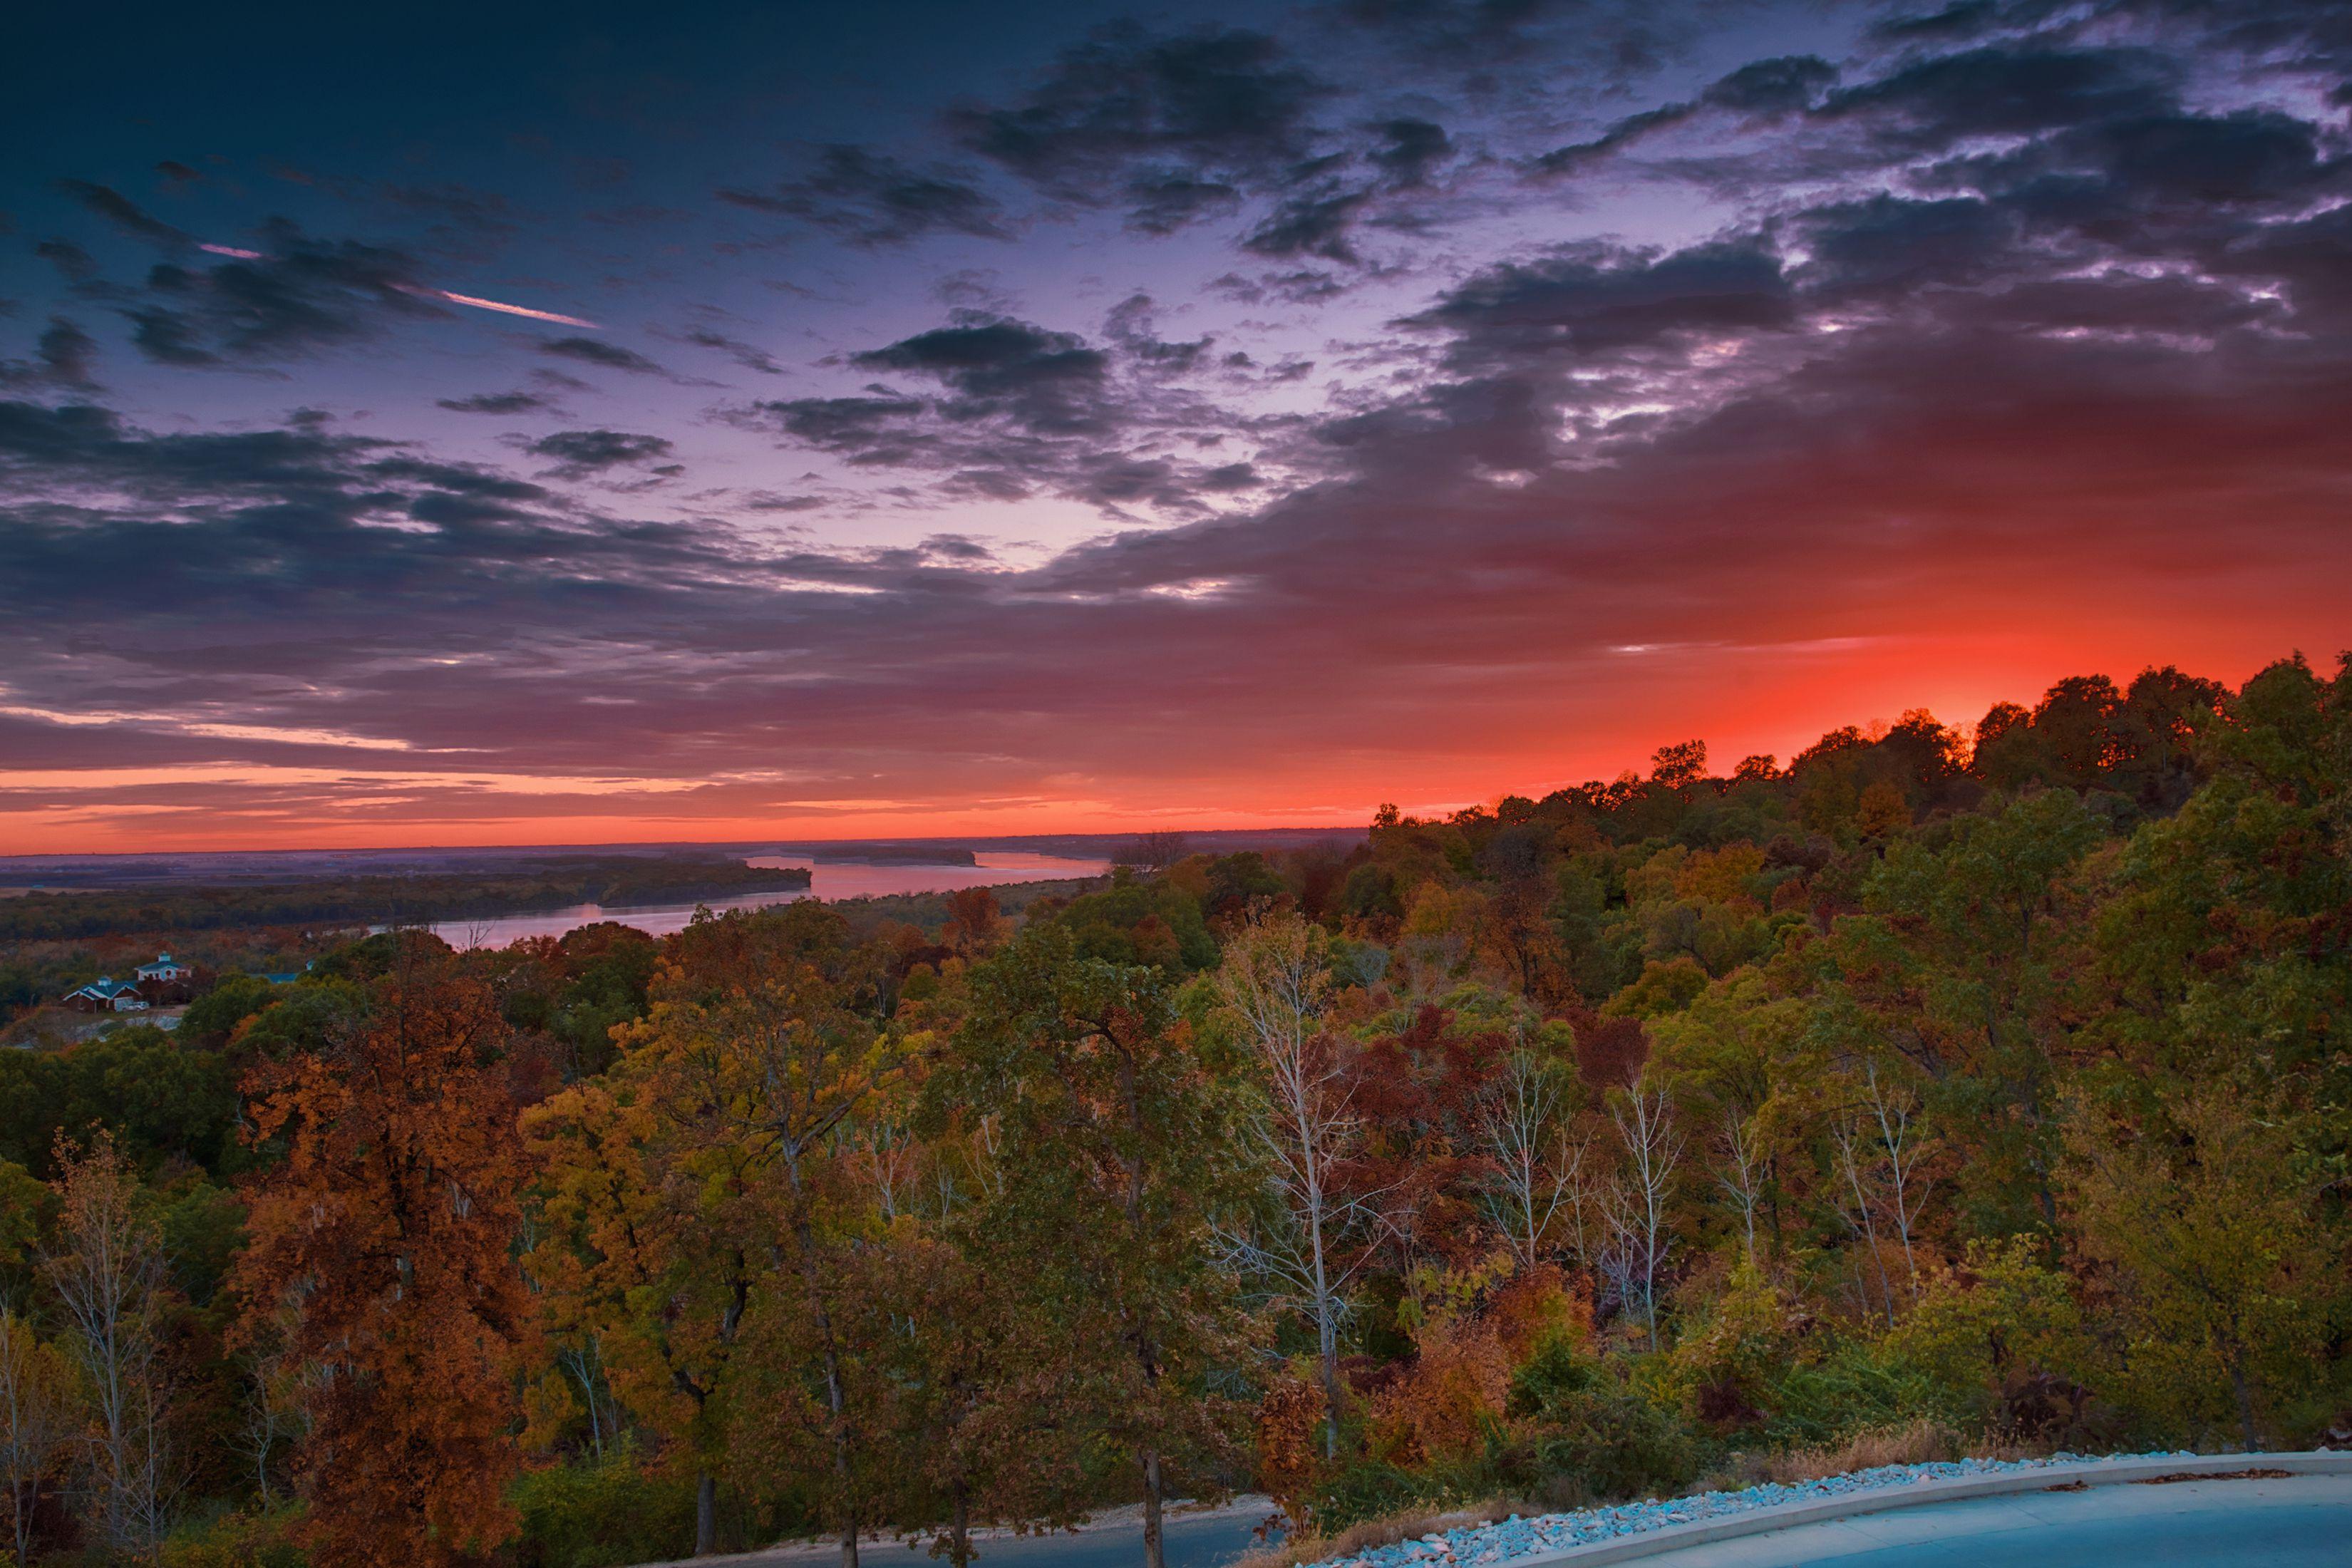 Colorful sunset over Missouri river in Alton, Illinois